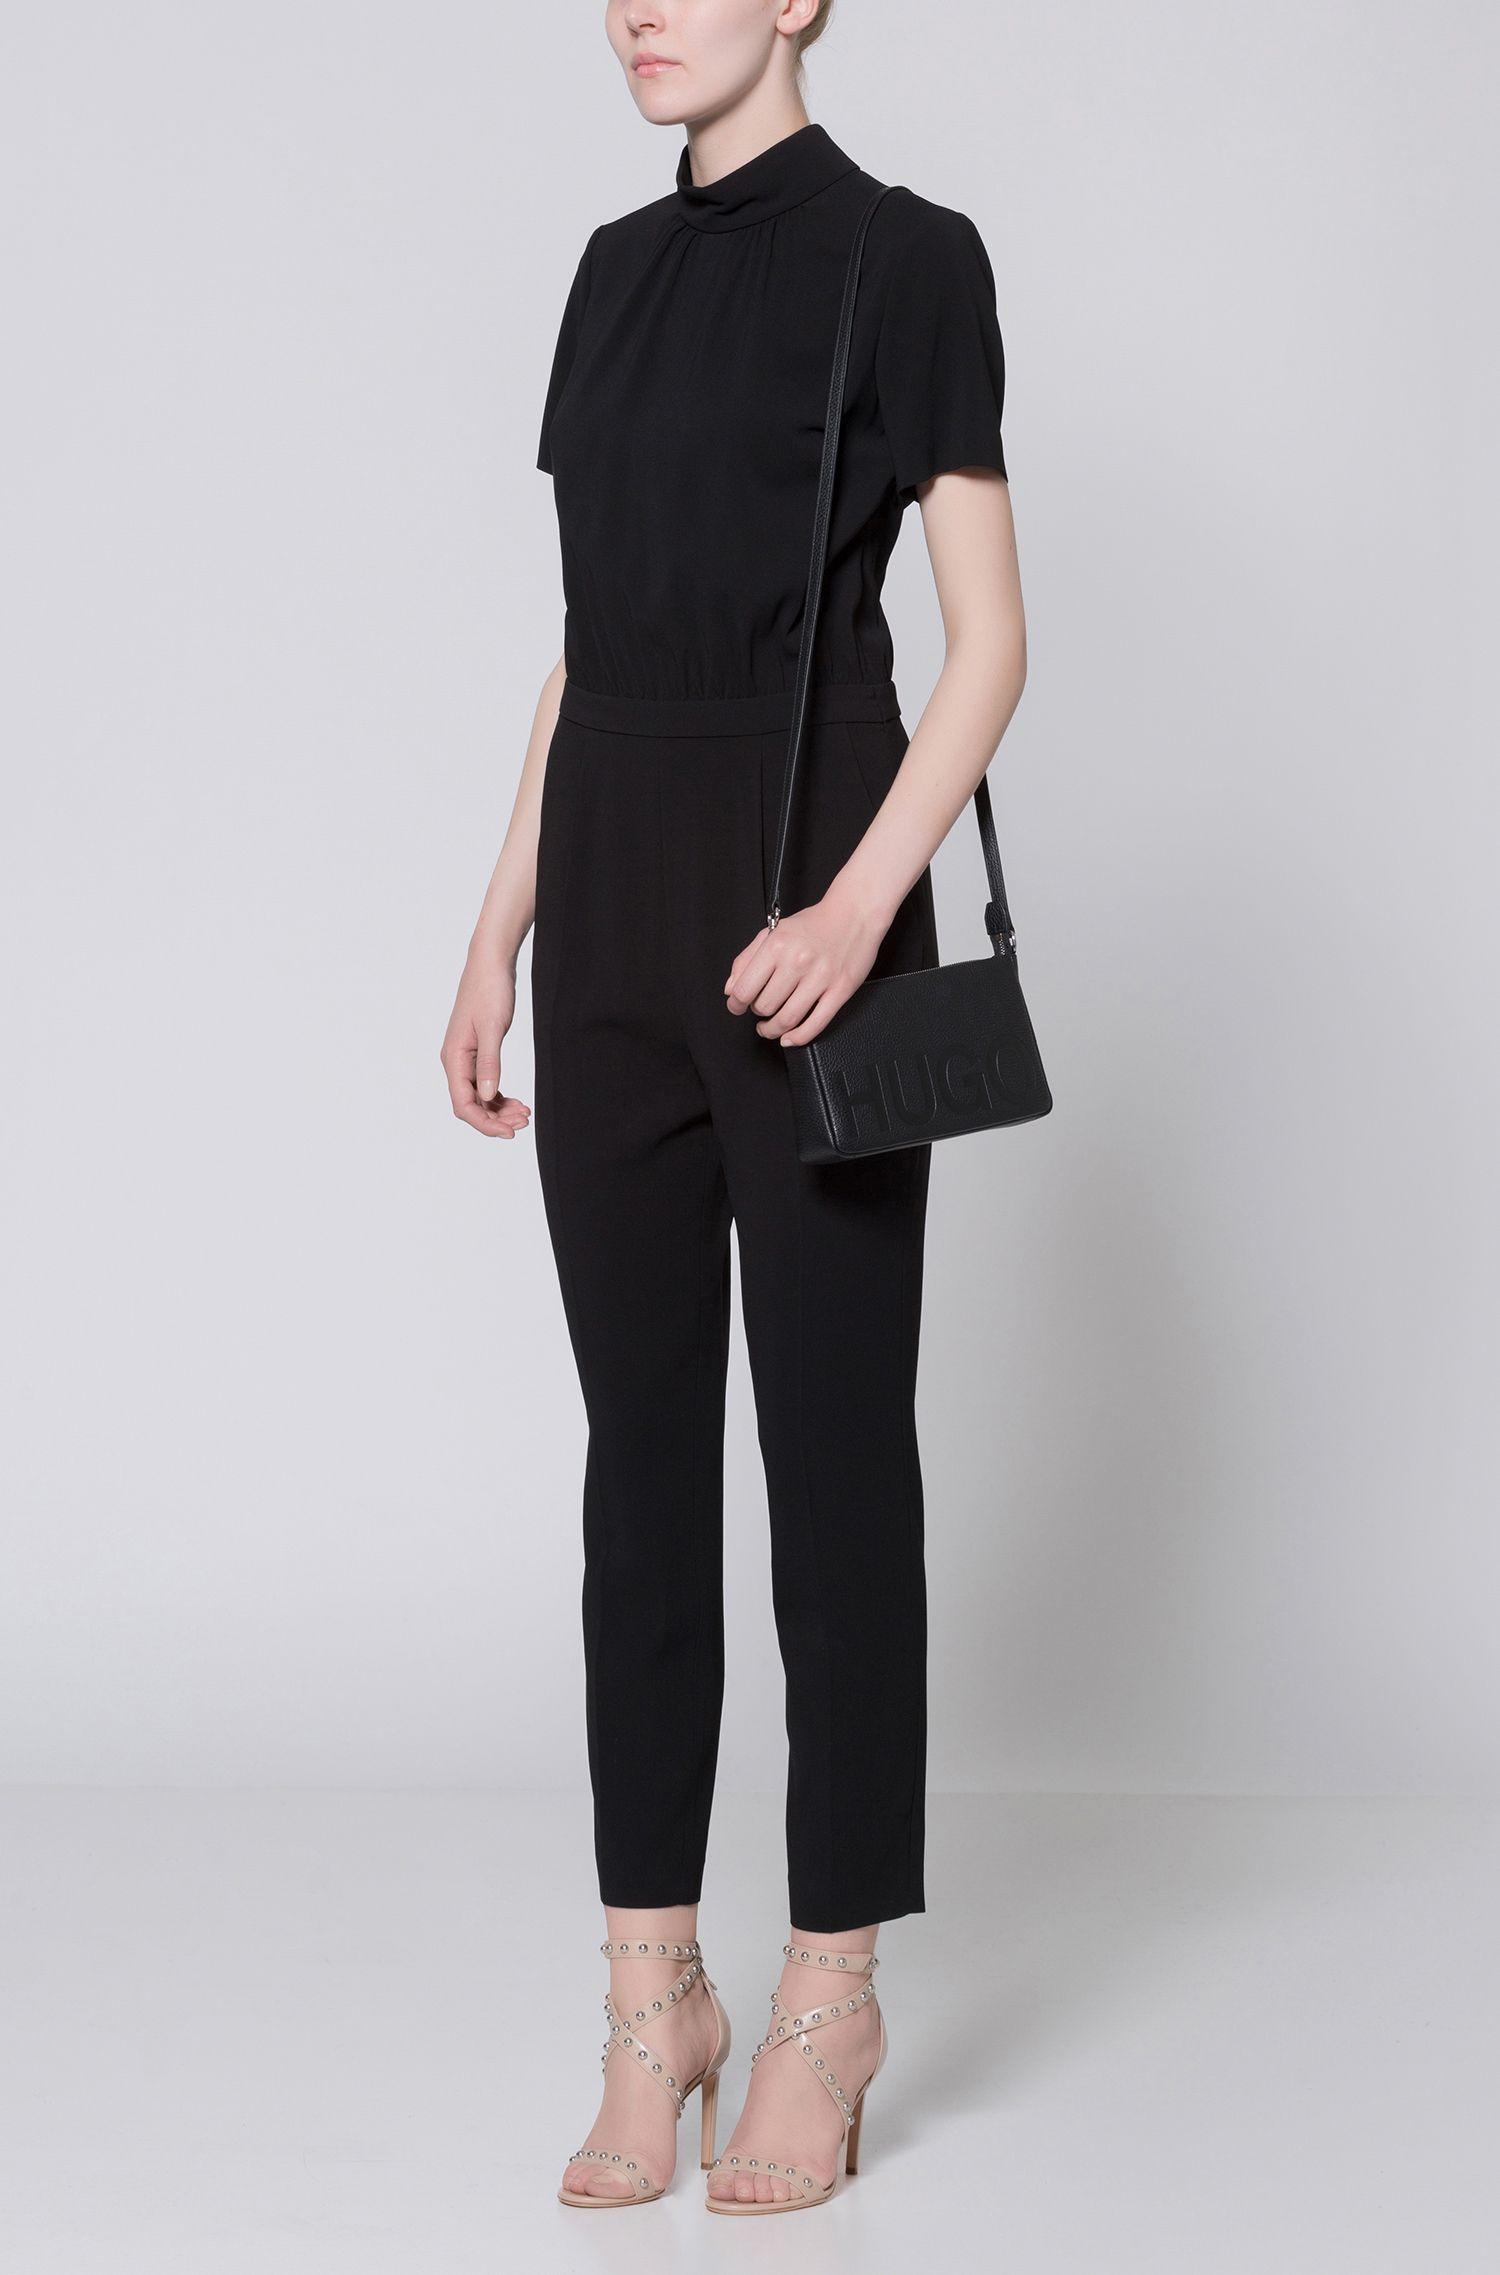 Debossed Leather Bag | Mayfair Mini Bag